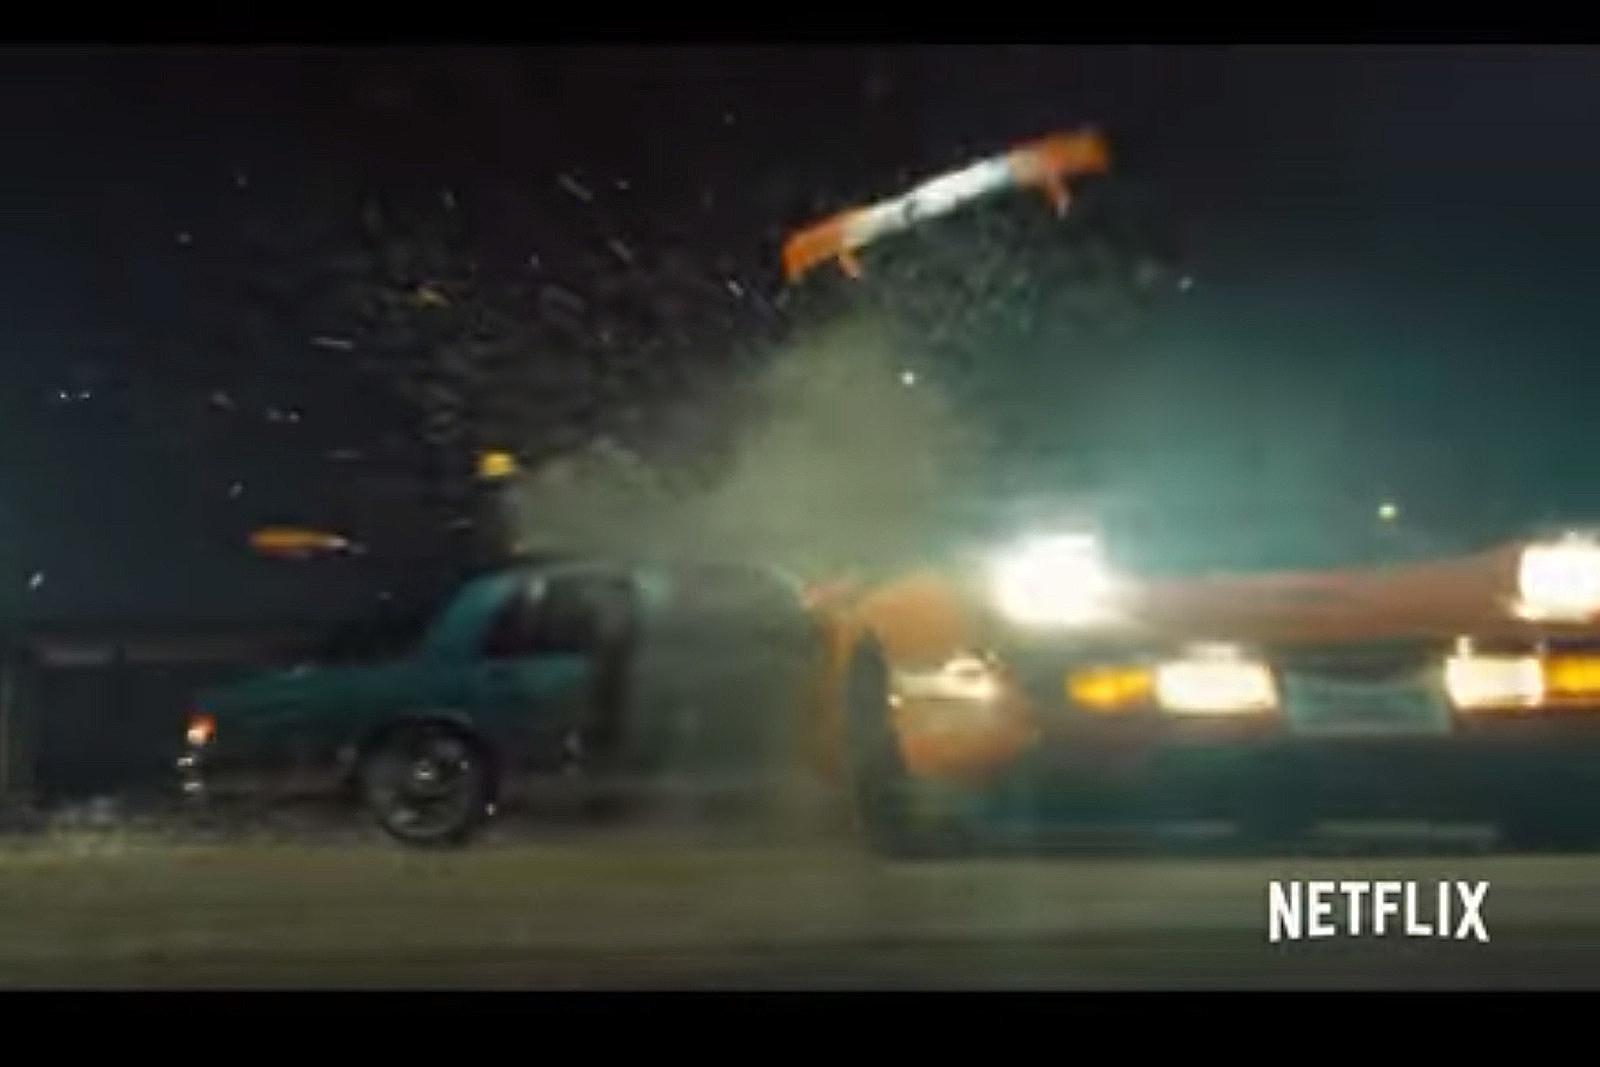 The Aftermath of Vince Neil's Car Crash